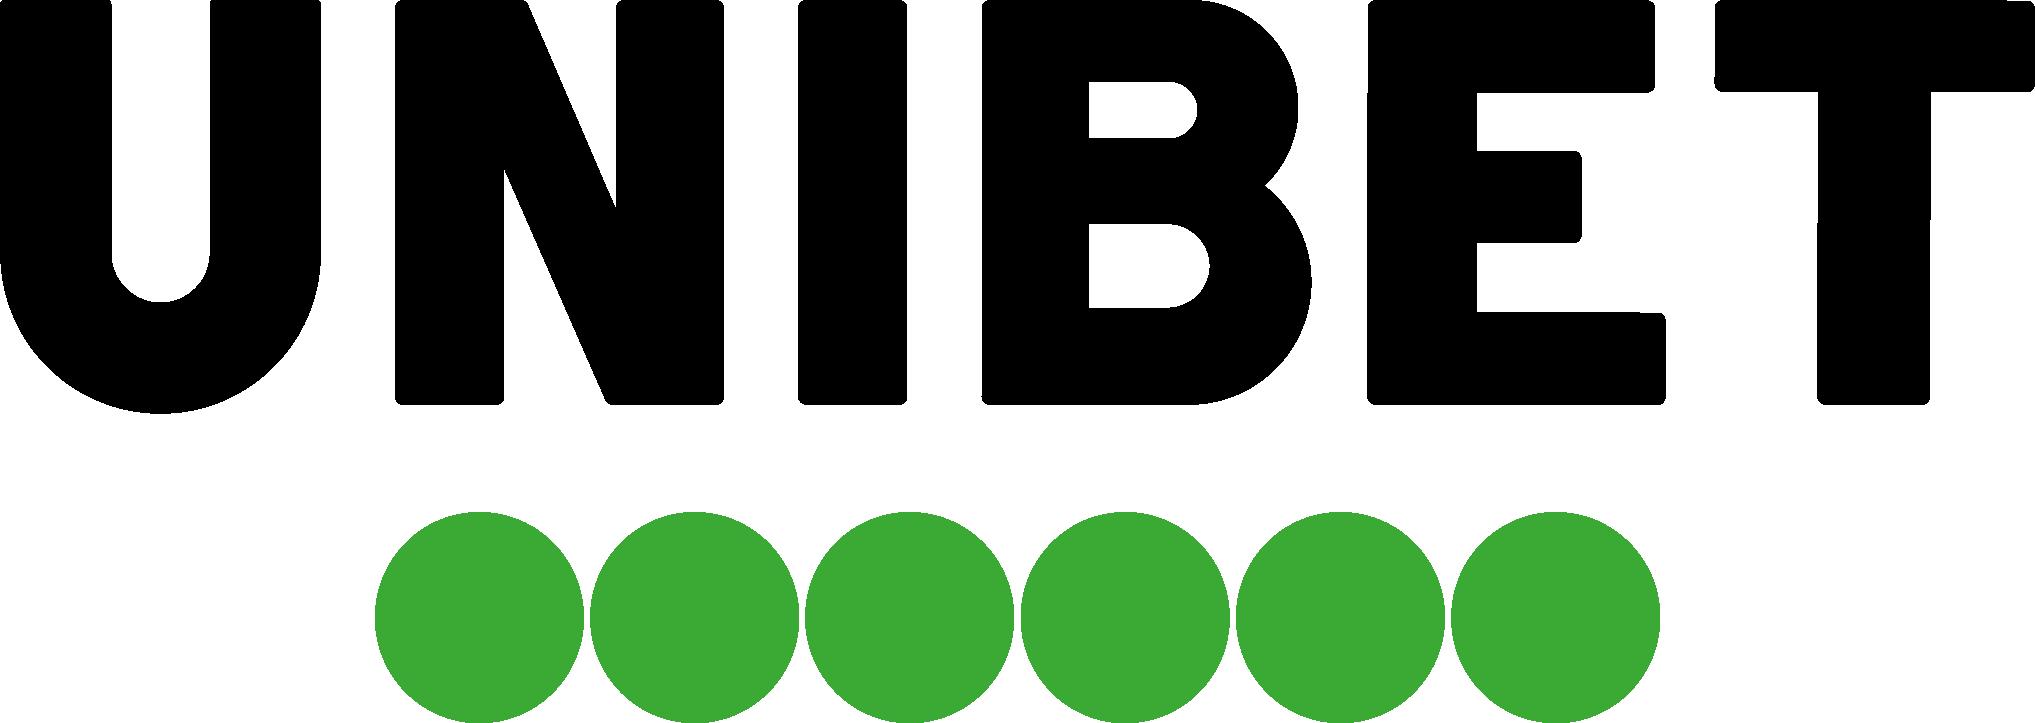 Unibet – Kindred Affiliates (formerly Unibet Affiliates)